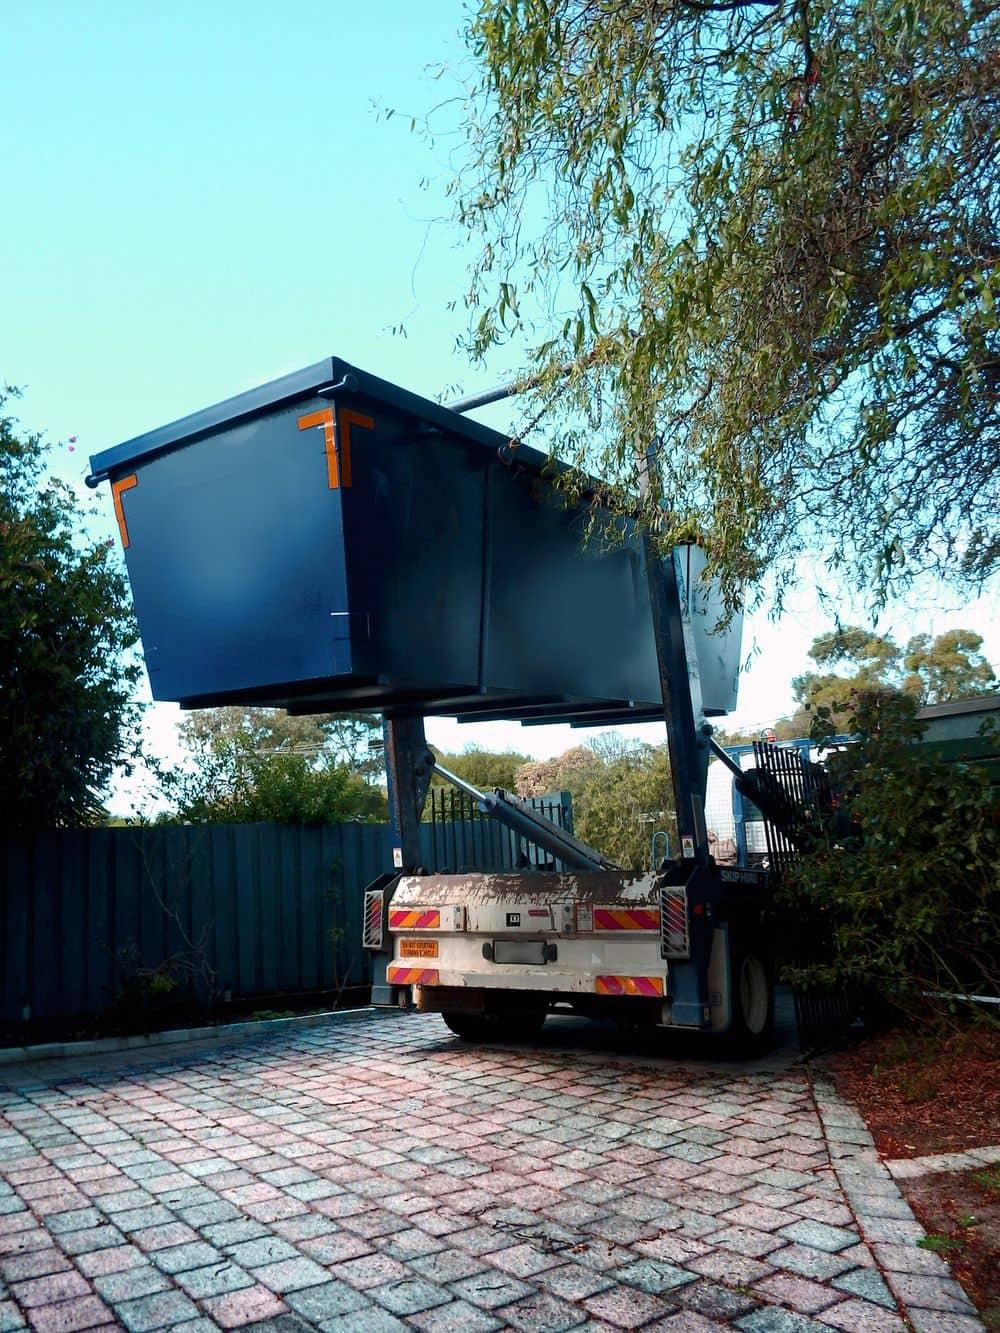 dumpster rental service miami